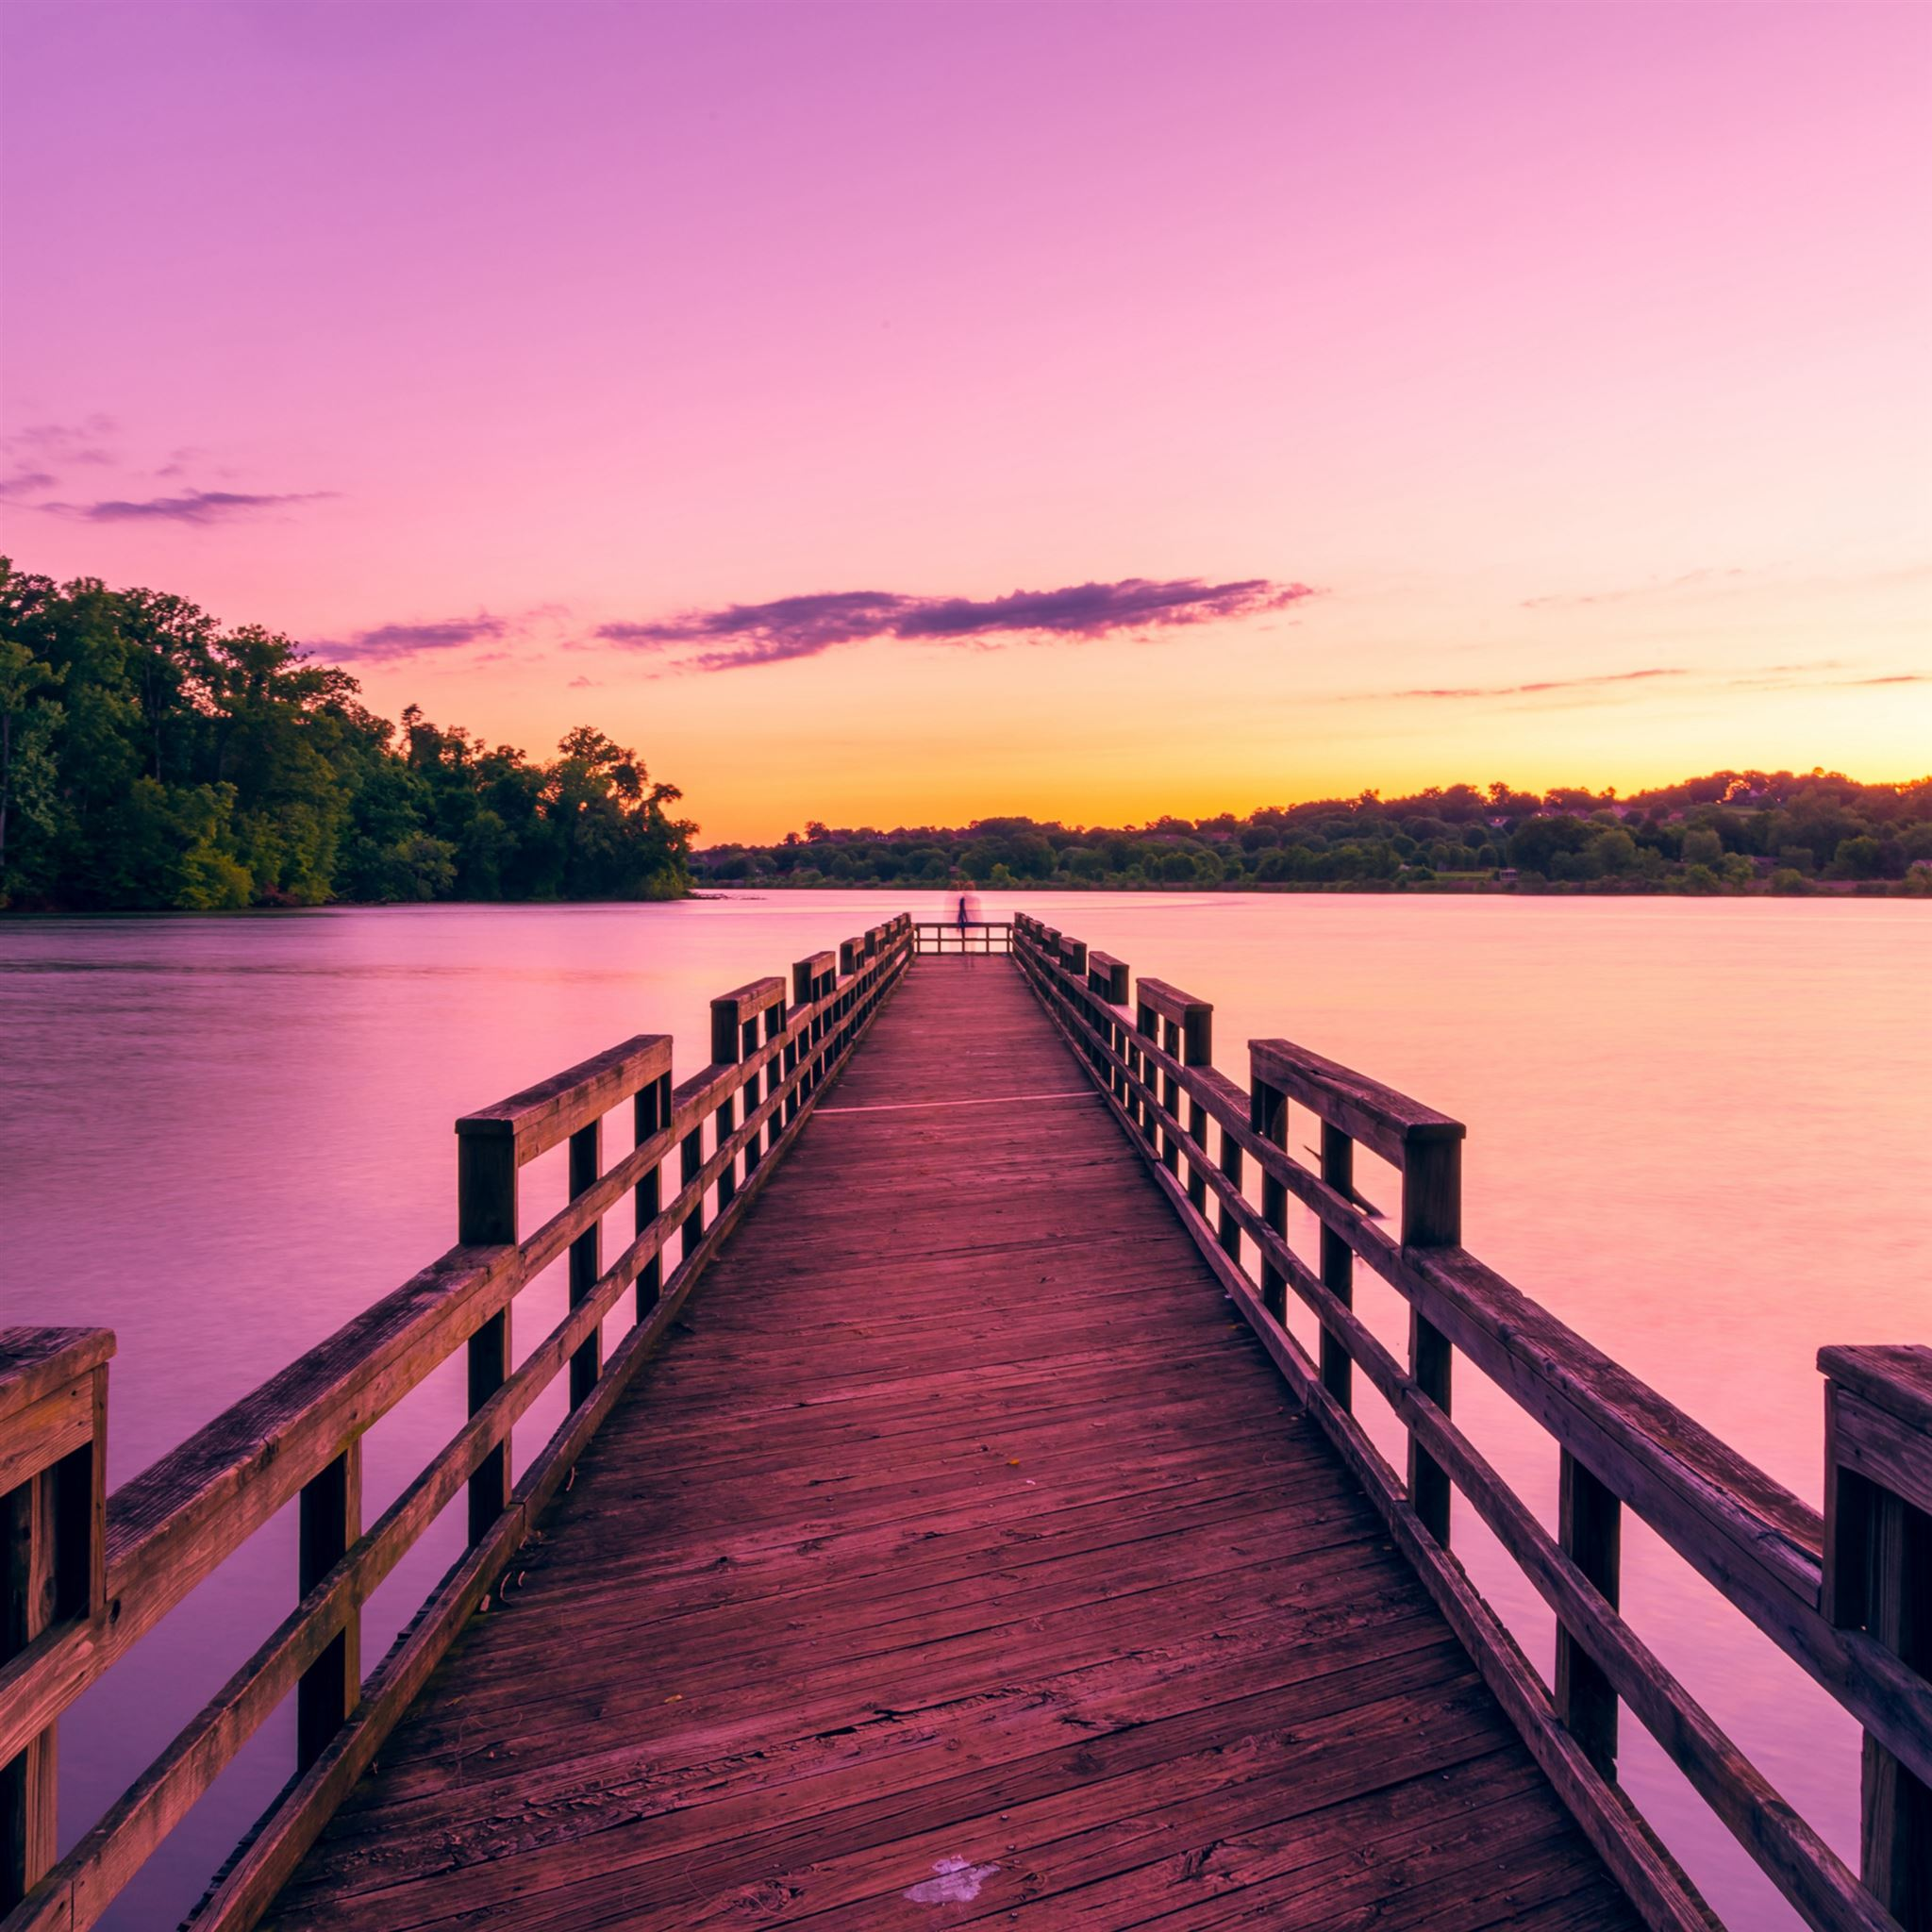 Best Sunset Ipad Pro Wallpapers Hd Ilikewallpaper